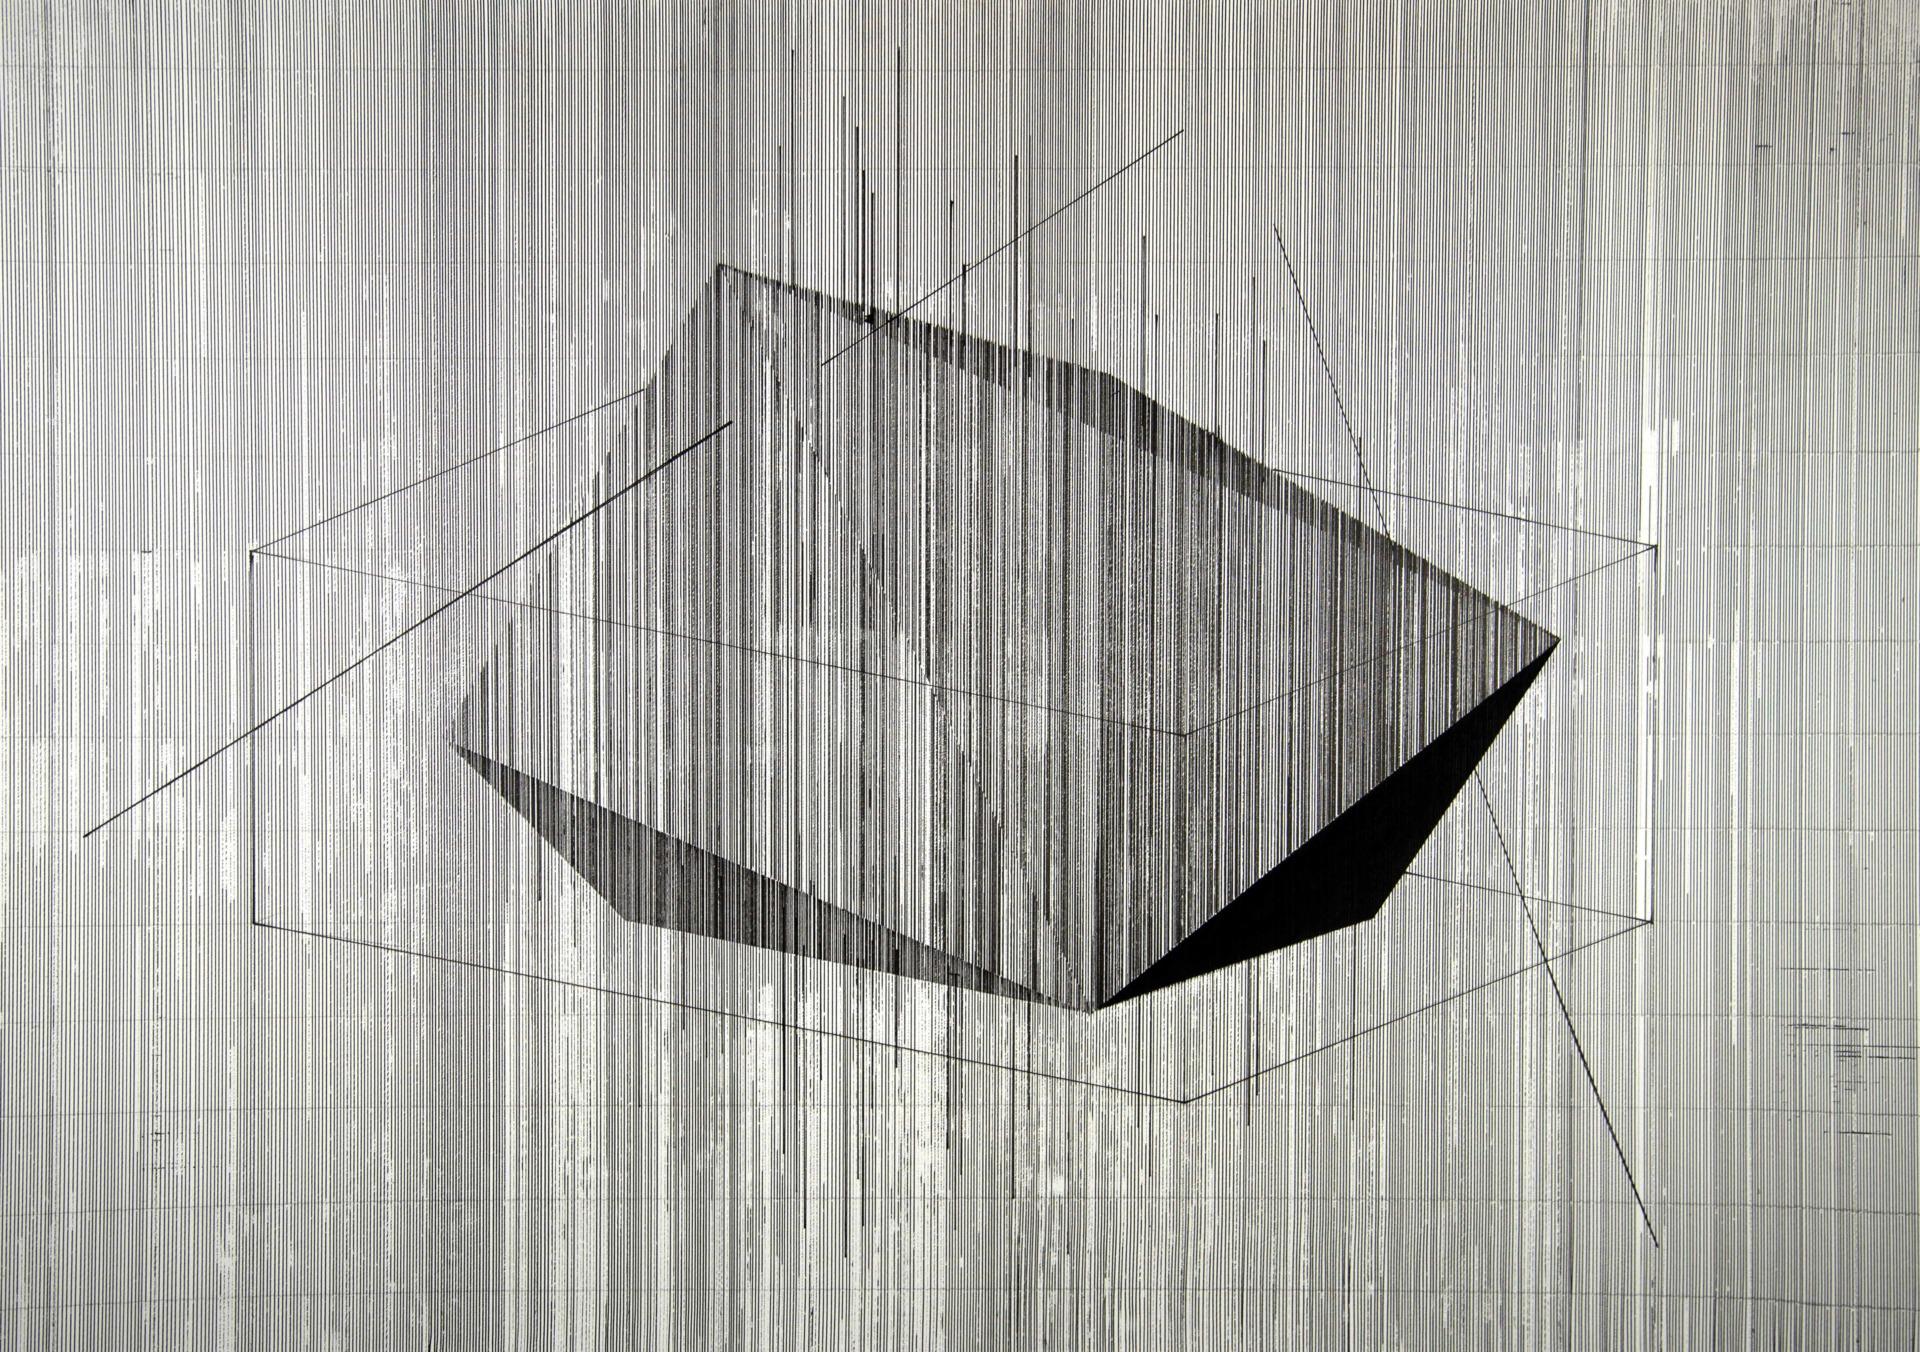 Contemporary art from Gyula Sági | Op. 160121. 8